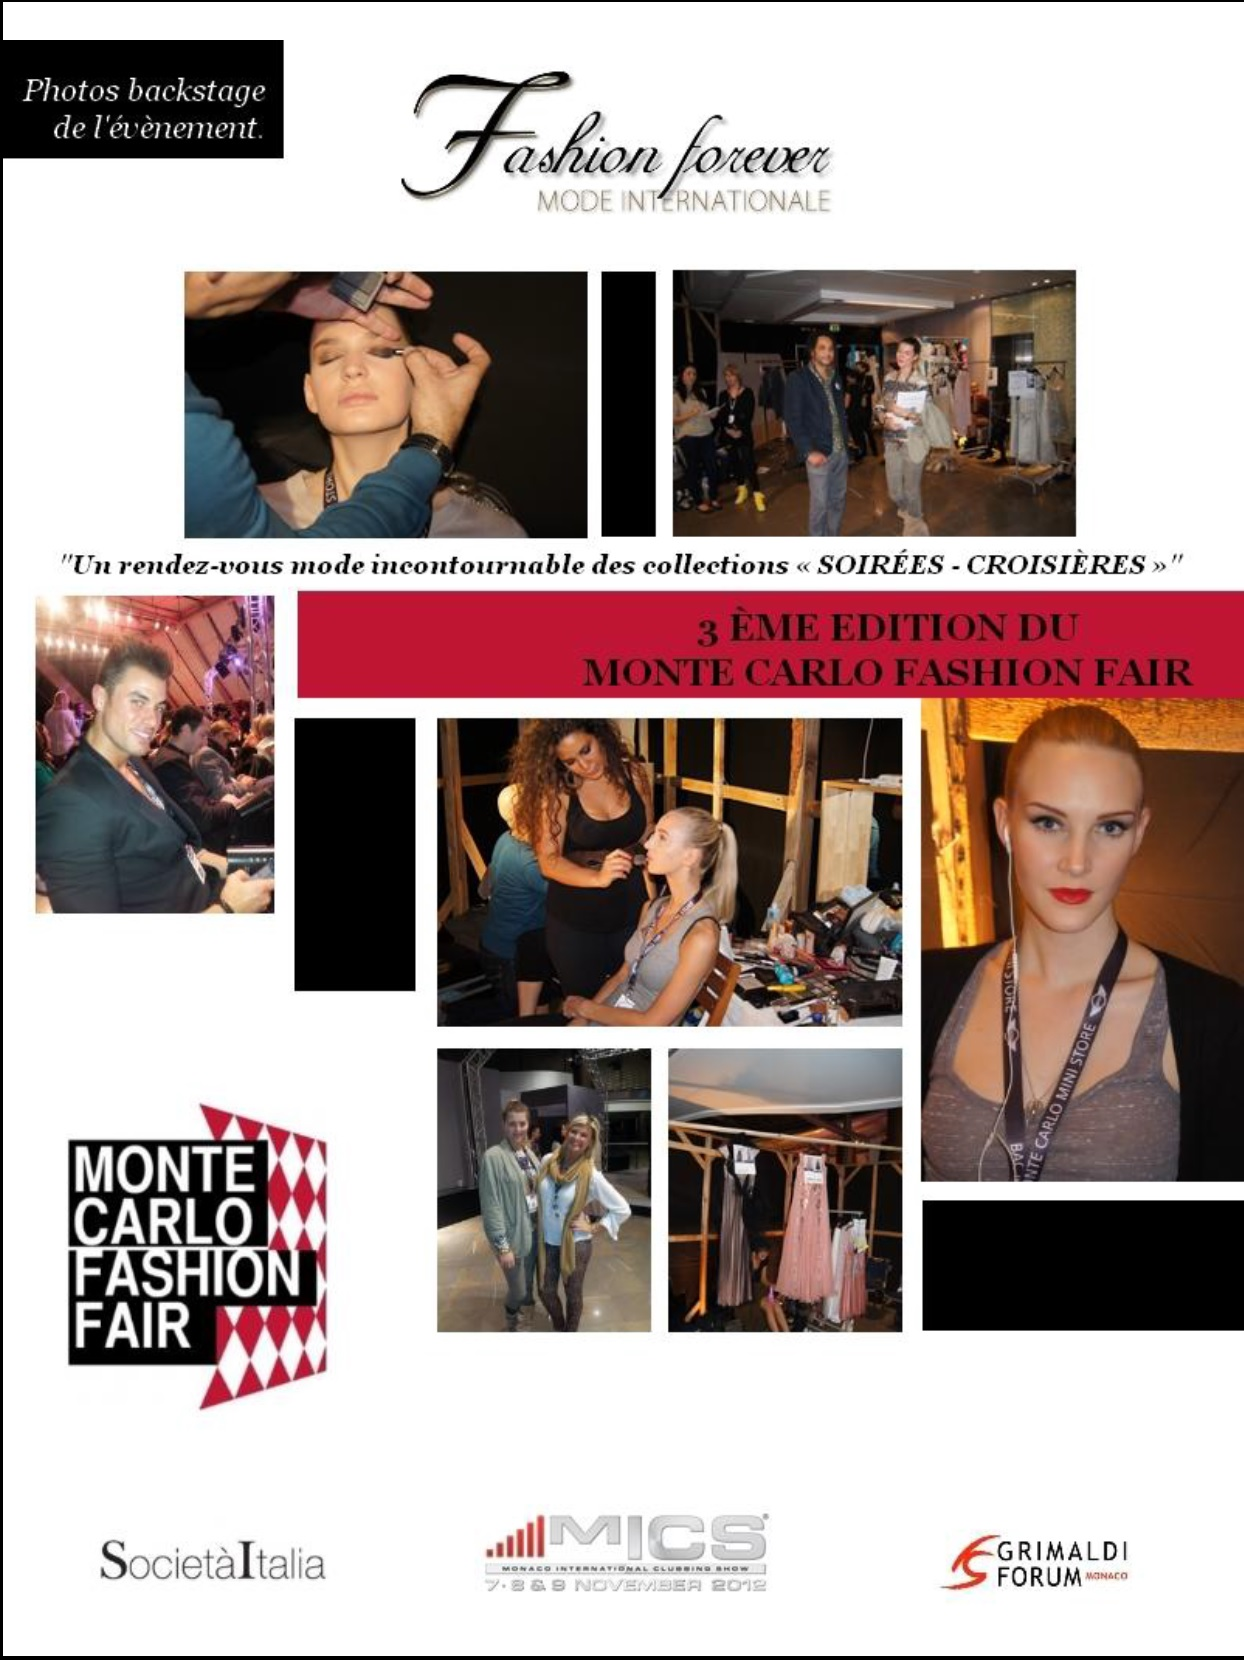 2012-FashionForever-1.jpg